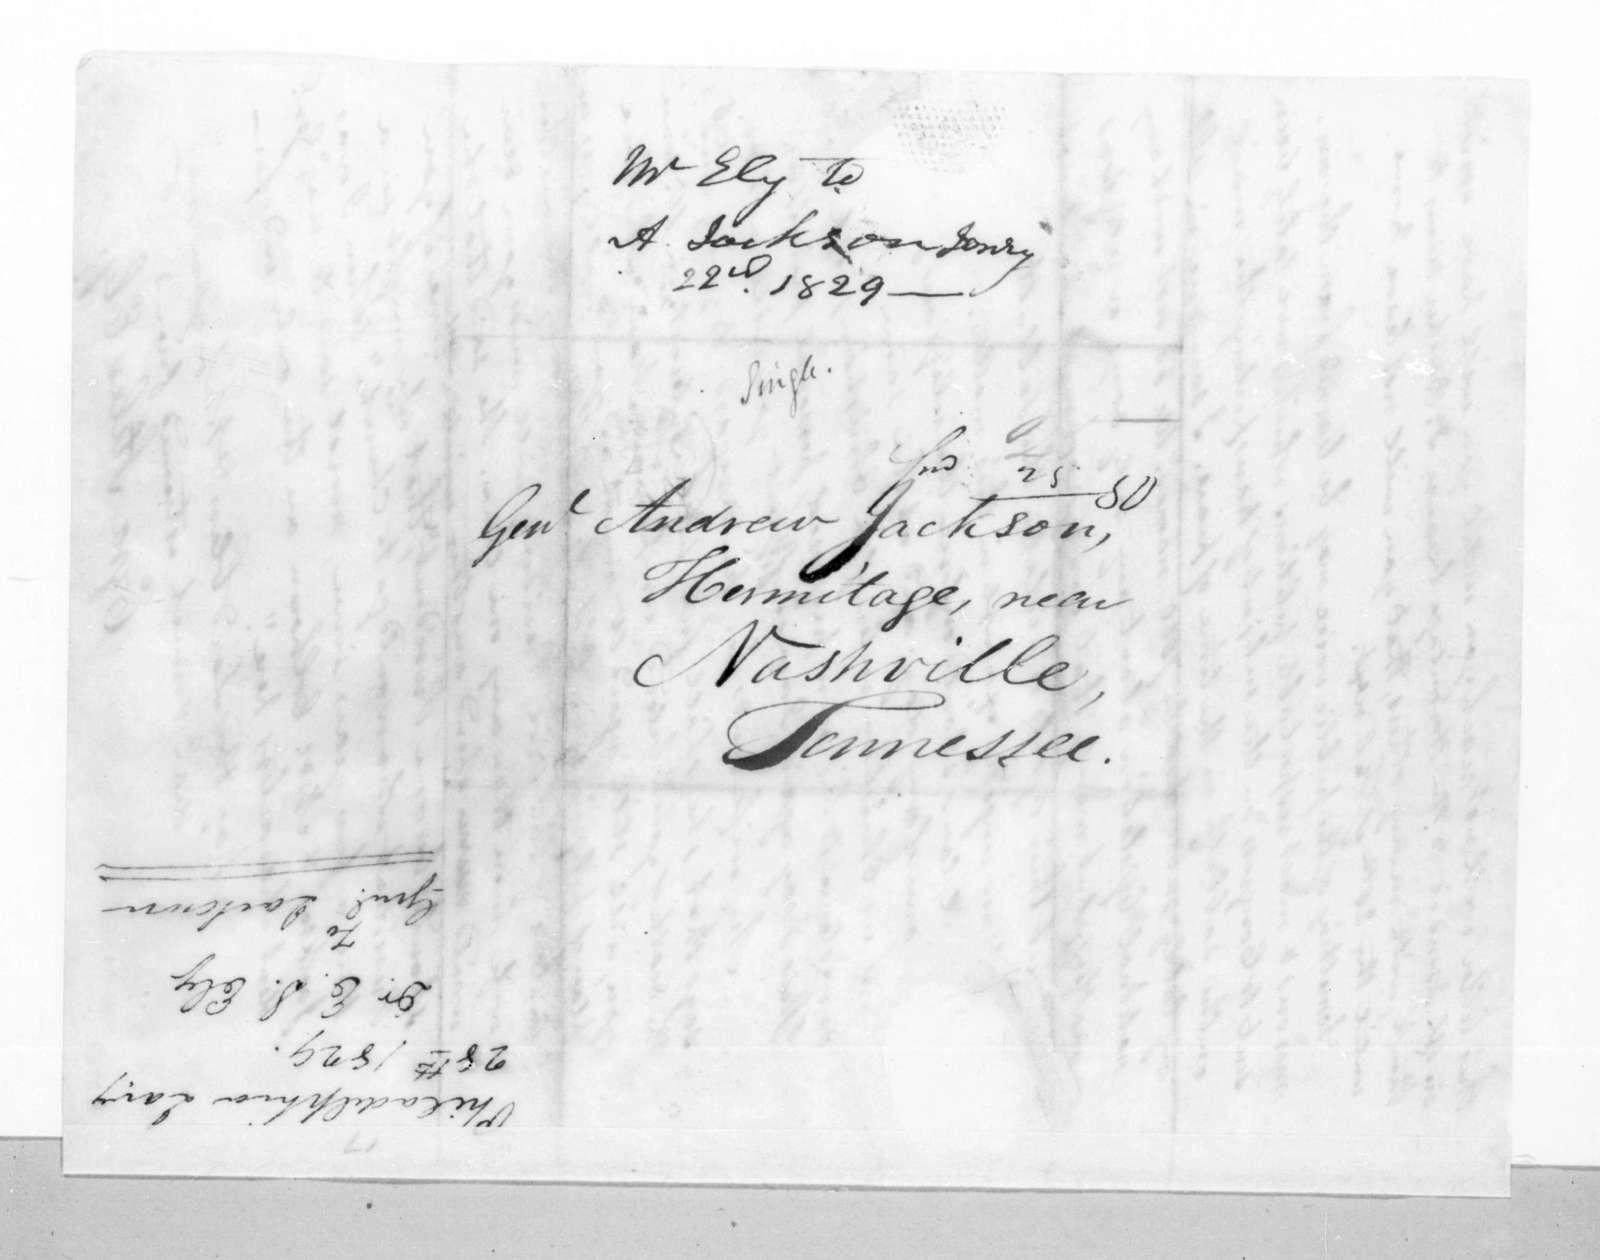 Ezra Stiles Ely to Andrew Jackson, January 28, 1829